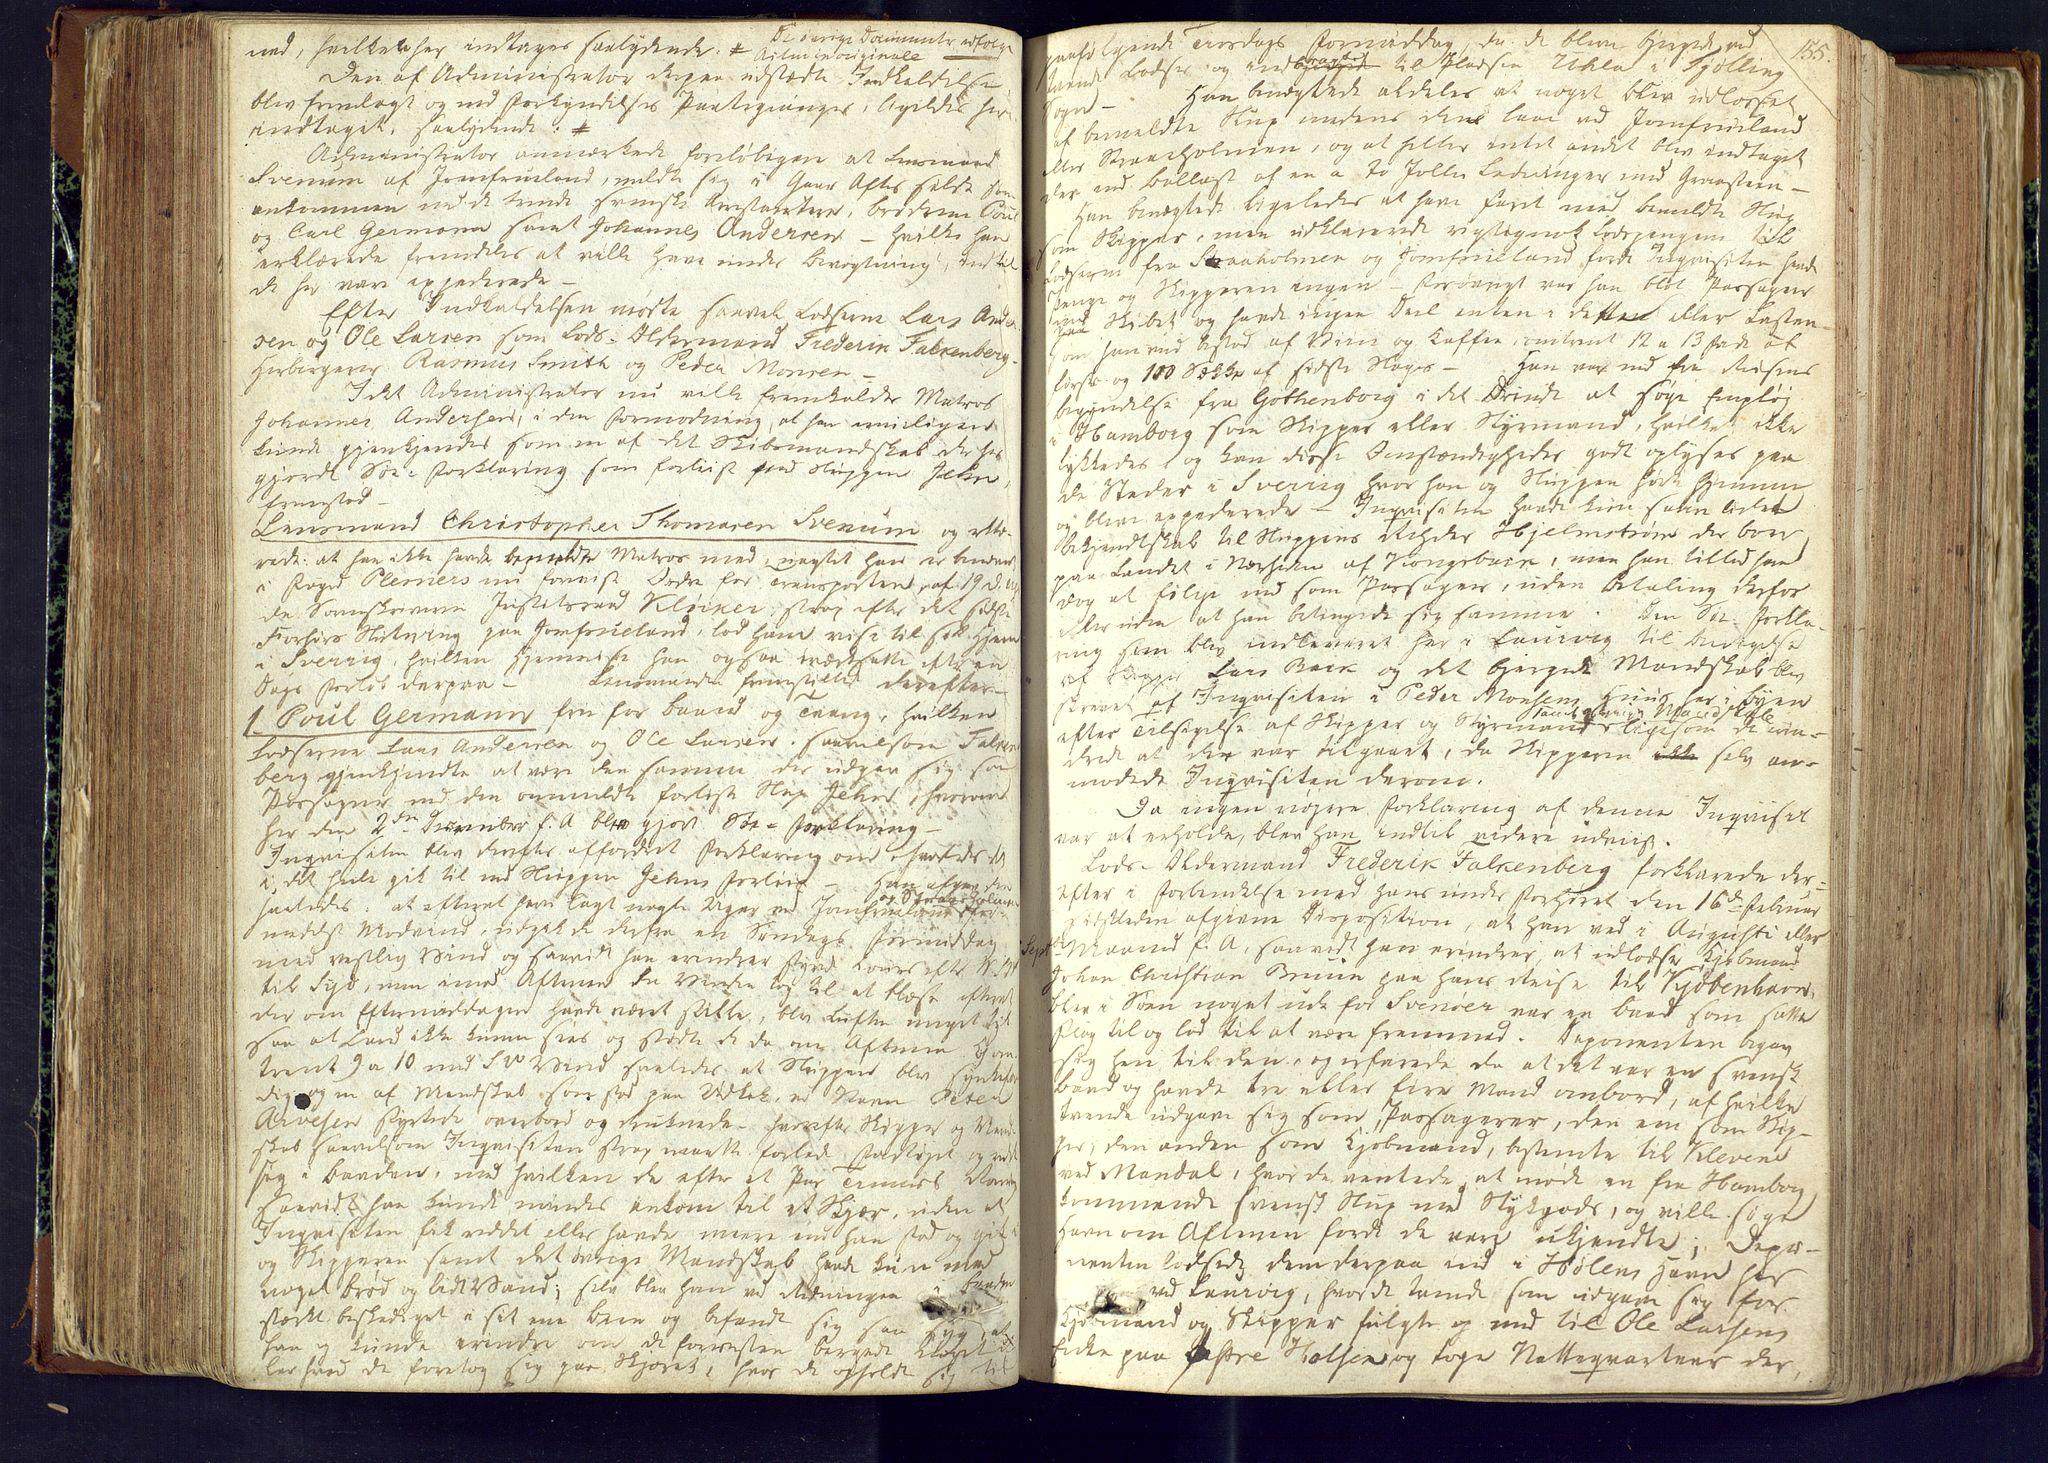 SAKO, Larvik sorenskriveri, F/Fc/L0001: Ekstrarettsprotokoll, 1817-1822, s. 155